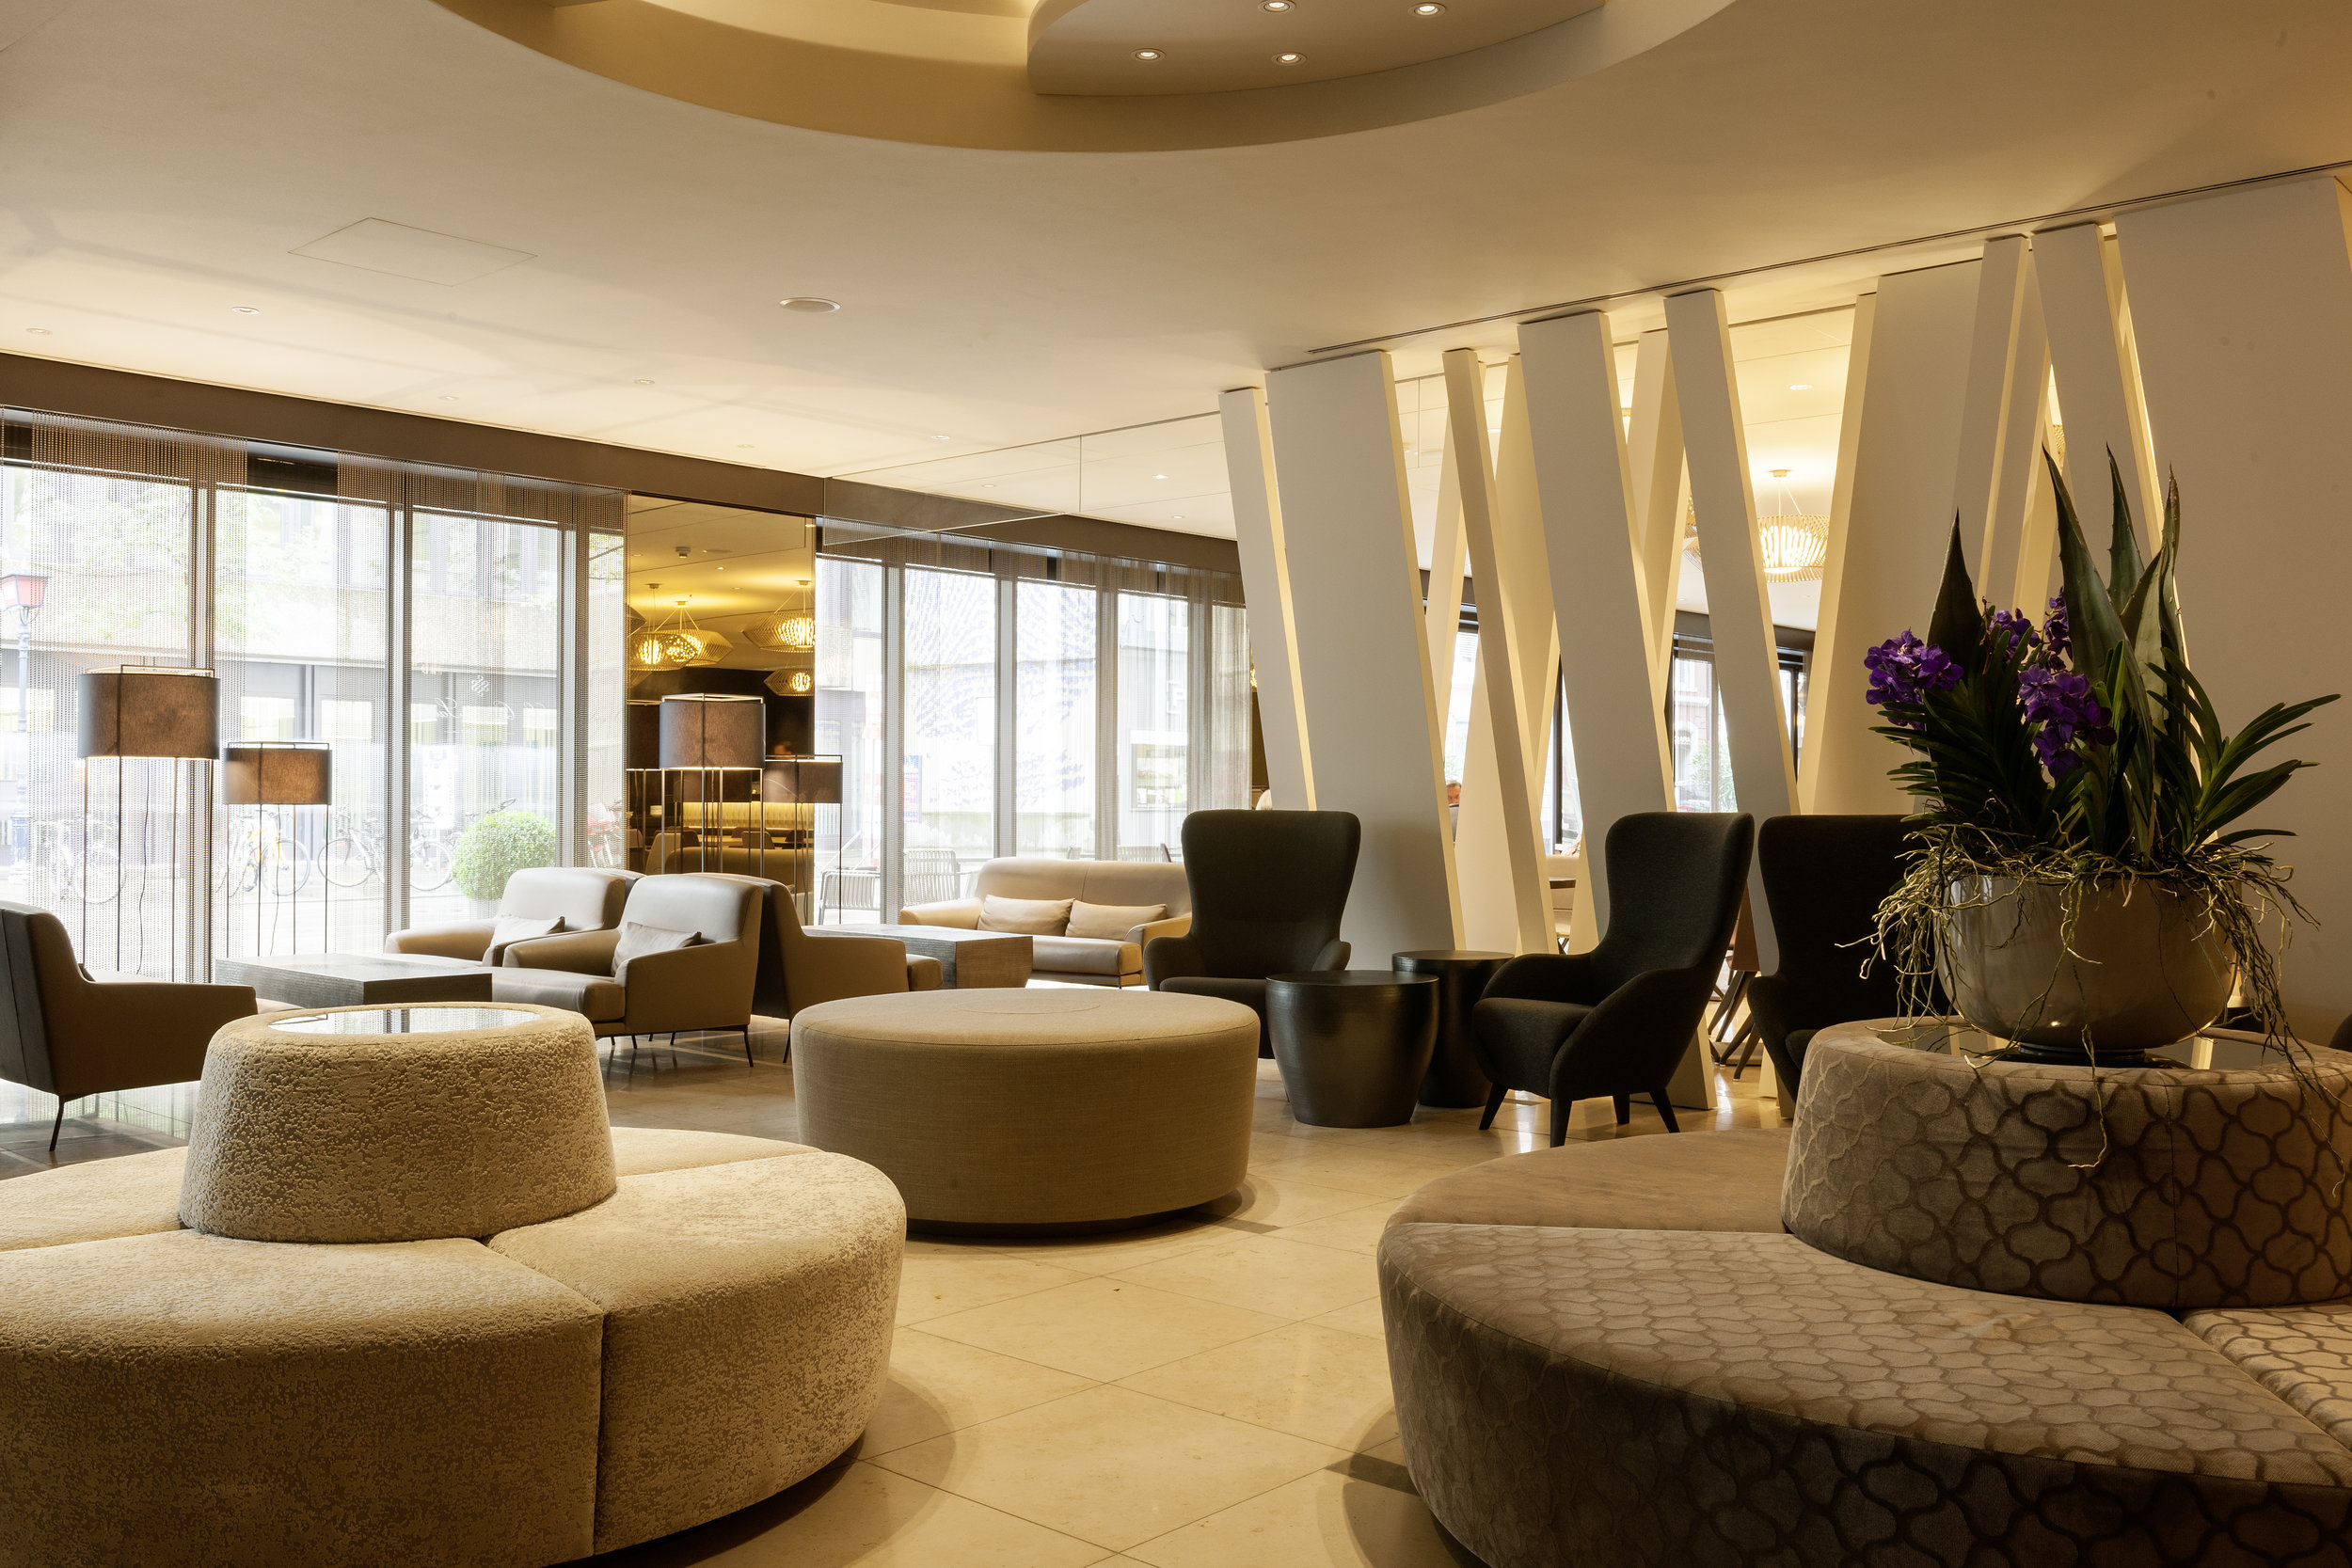 158_iria_degen_interiors_hotel_pullman_basel_europe2.jpg